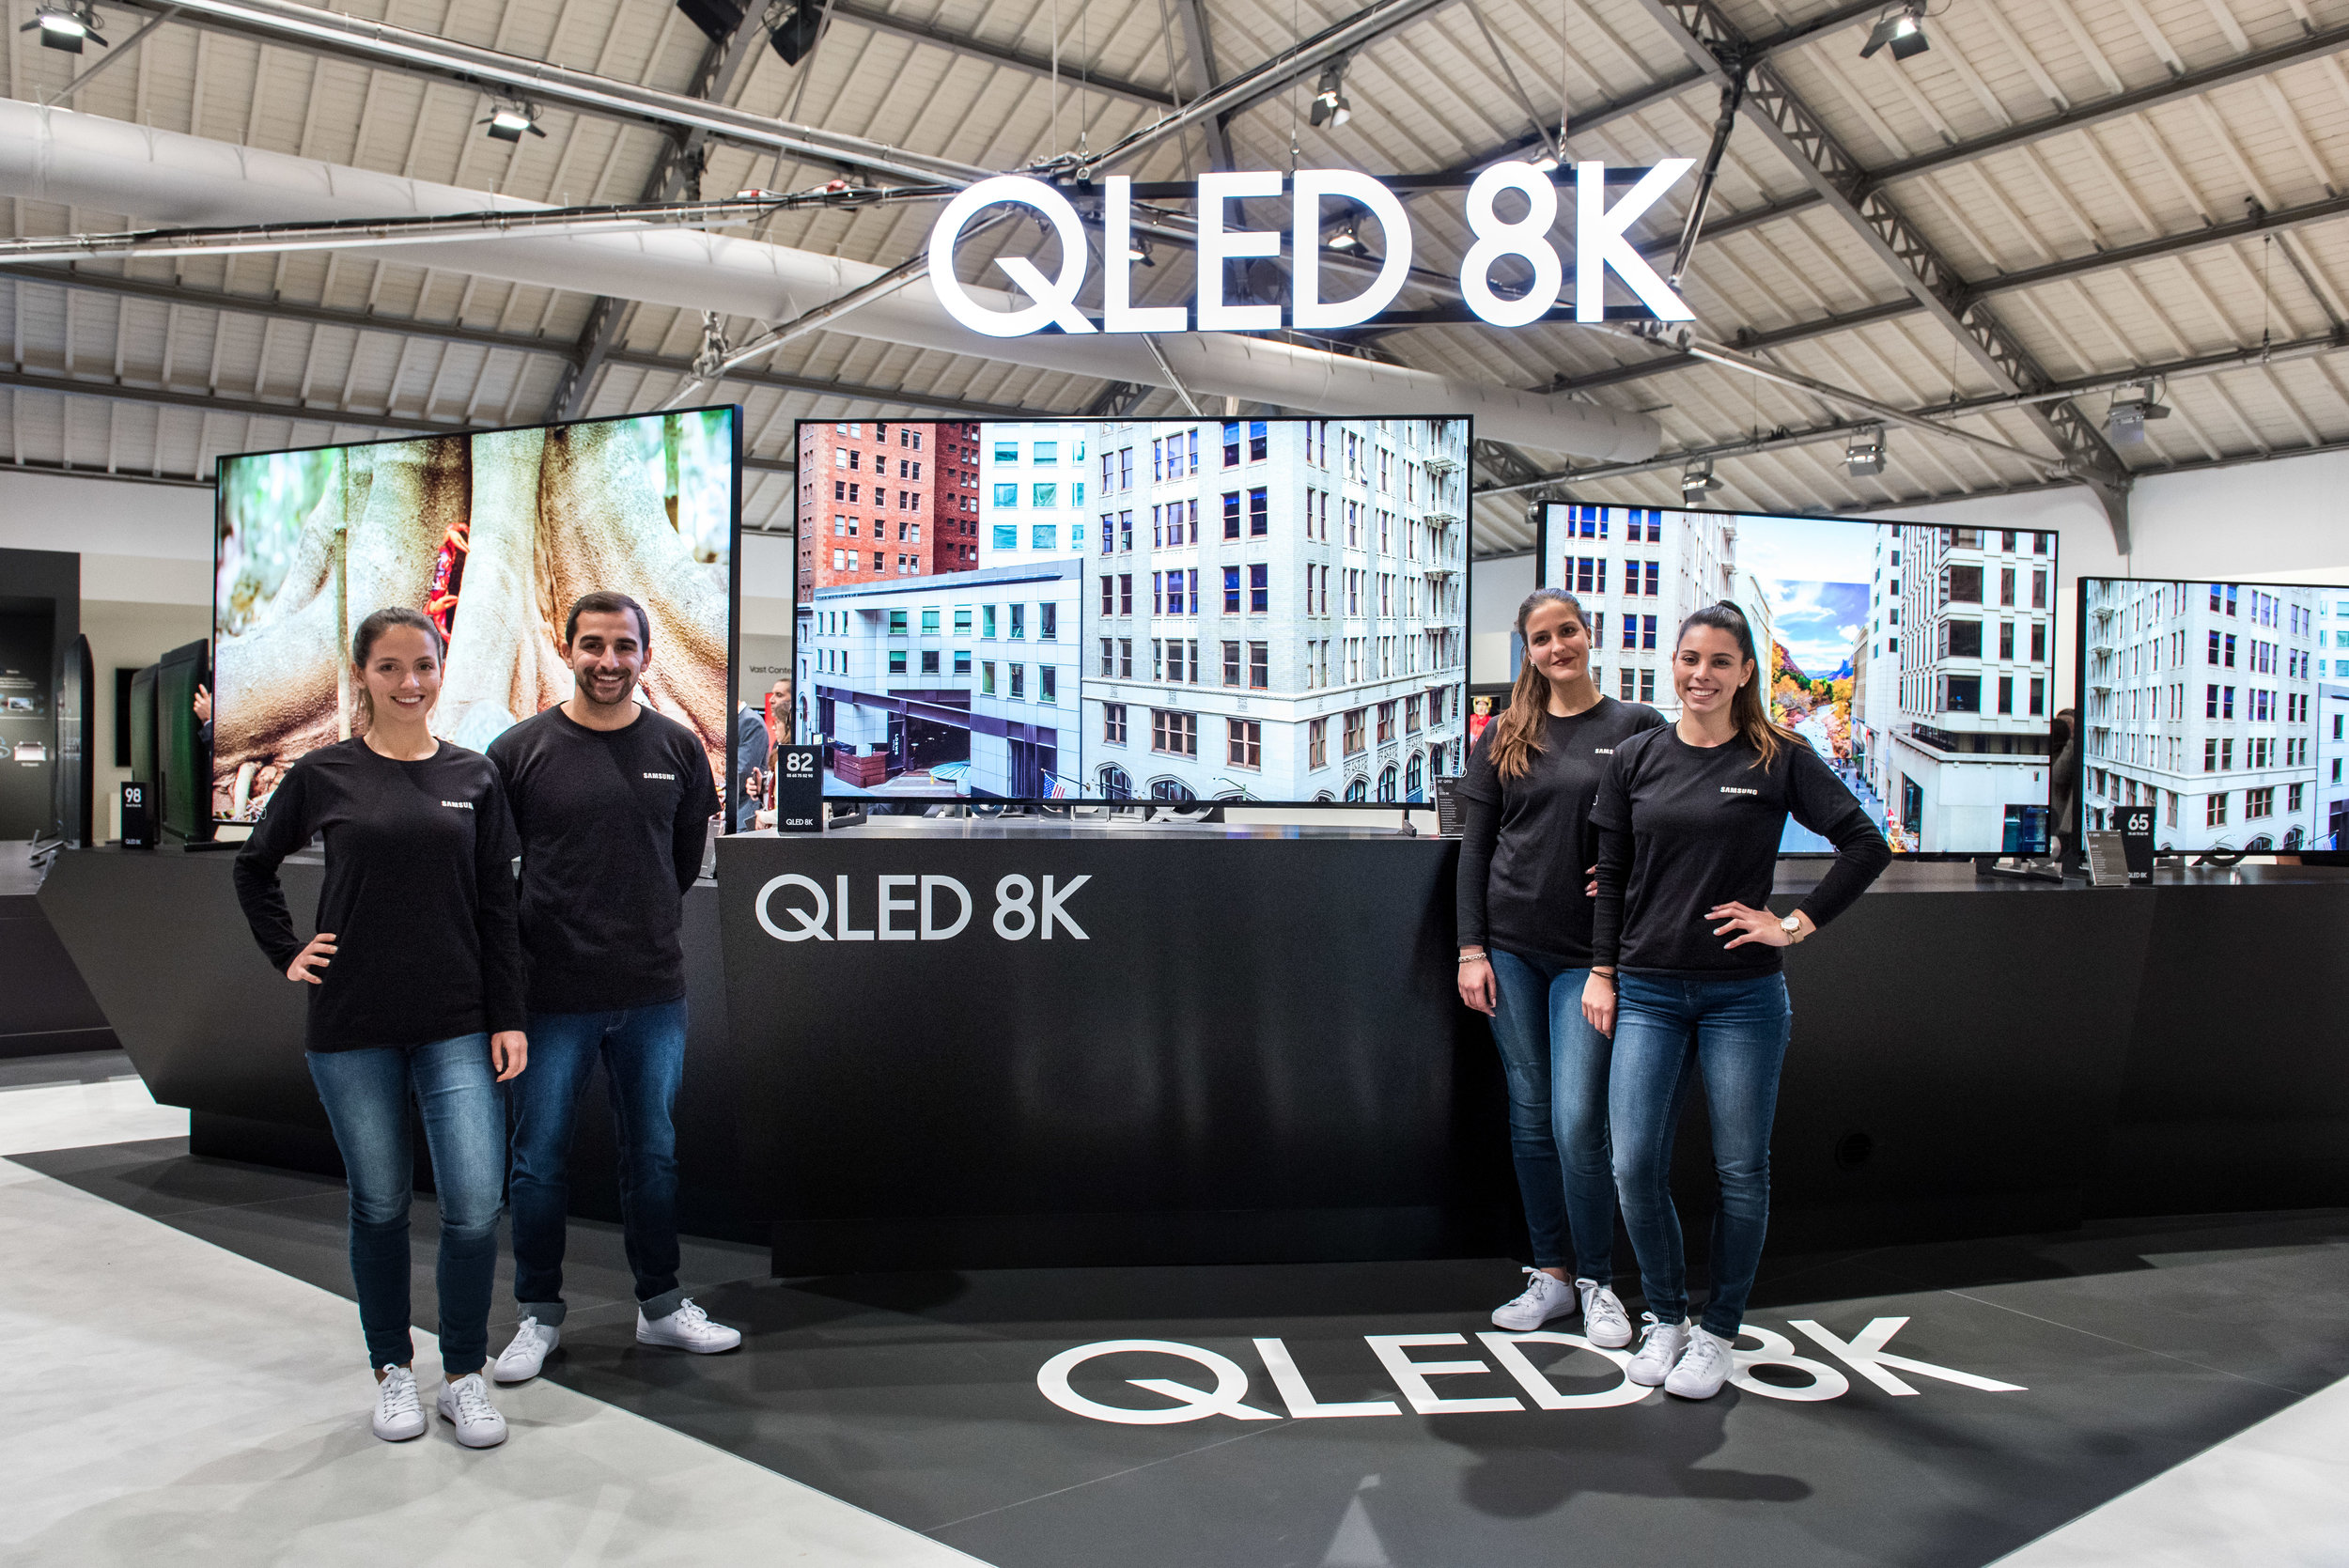 Samsung-2019-QLED-TV-announcement-1.jpg